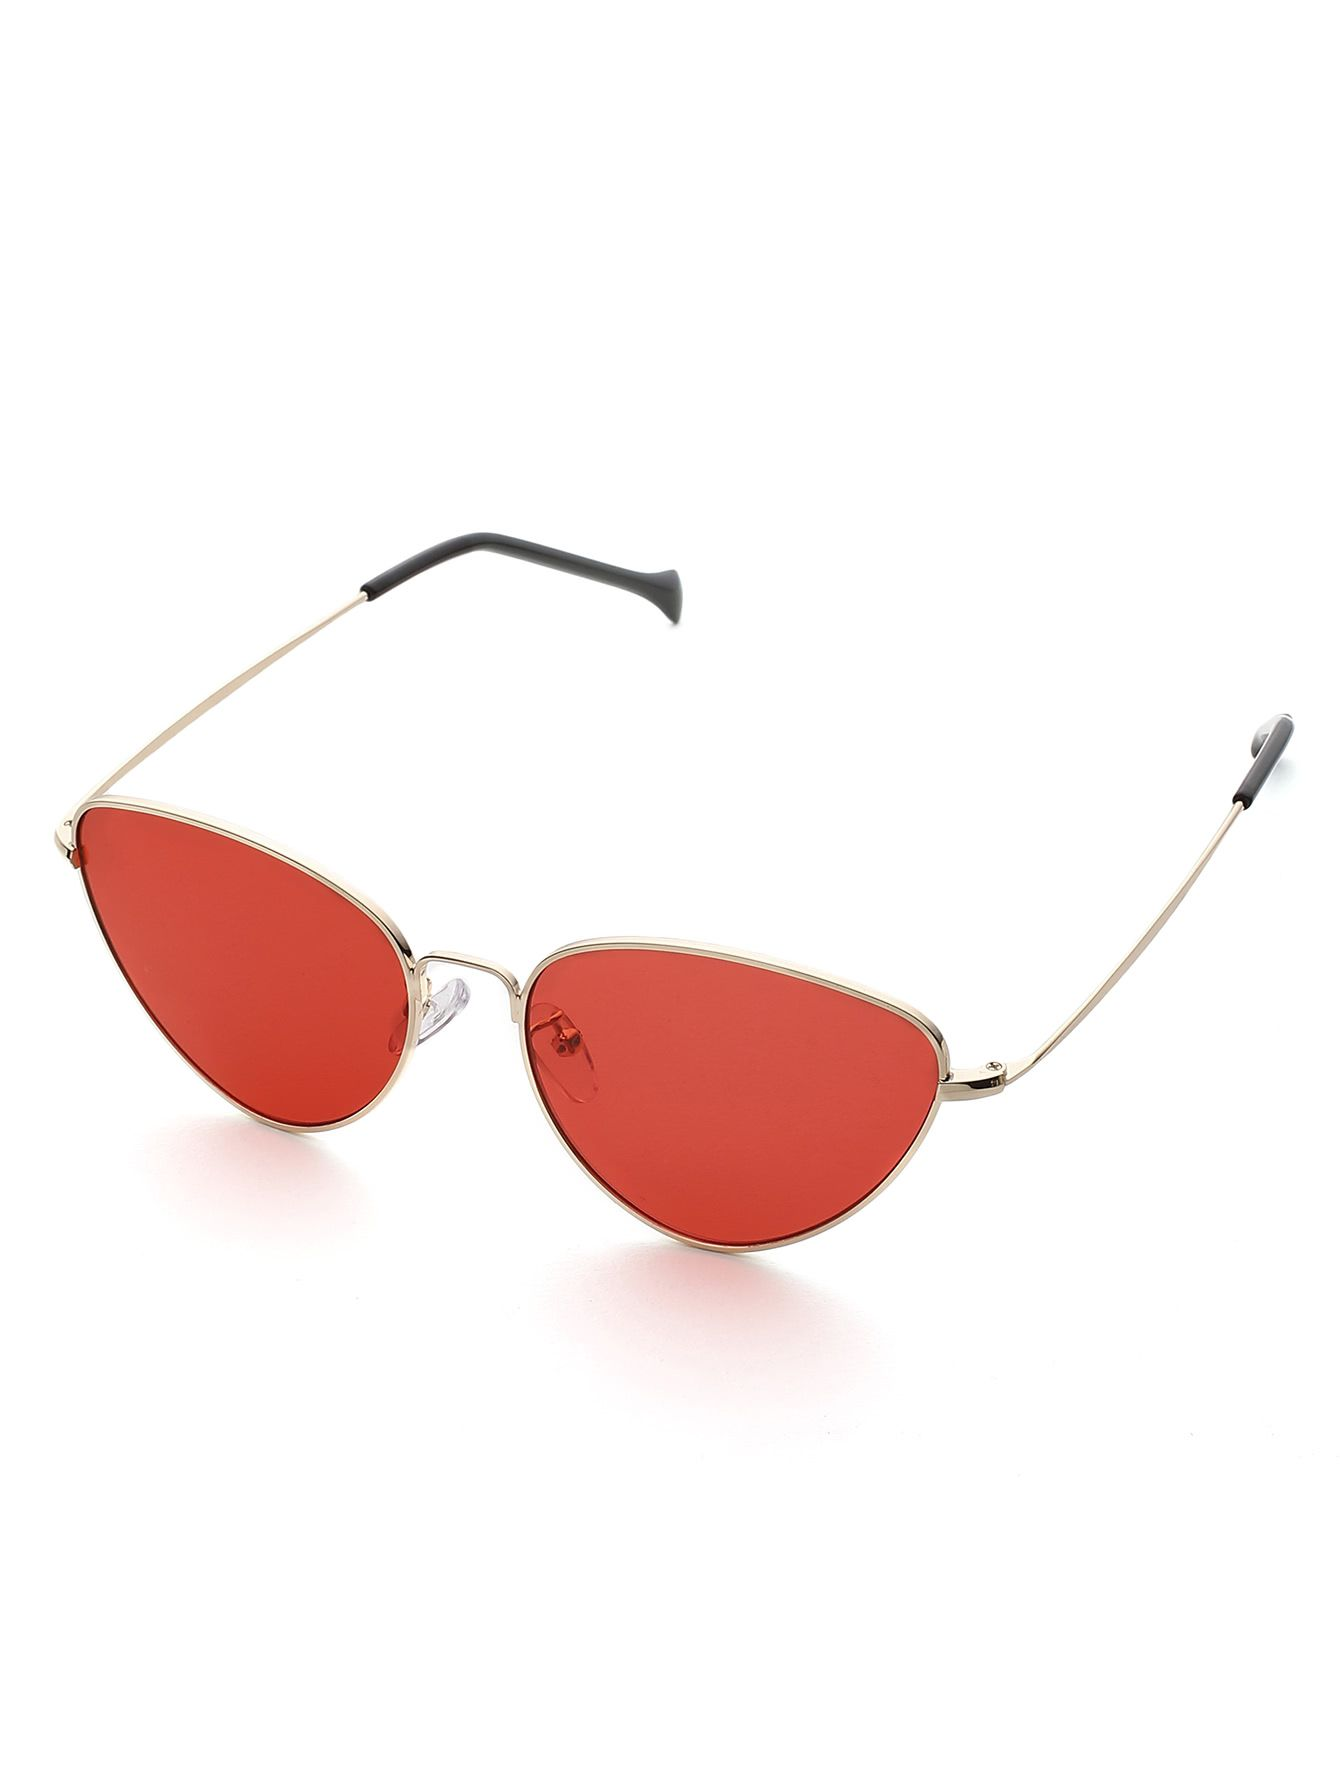 5283ae19f8 Oval Shaped Flat Lens Sunglasses